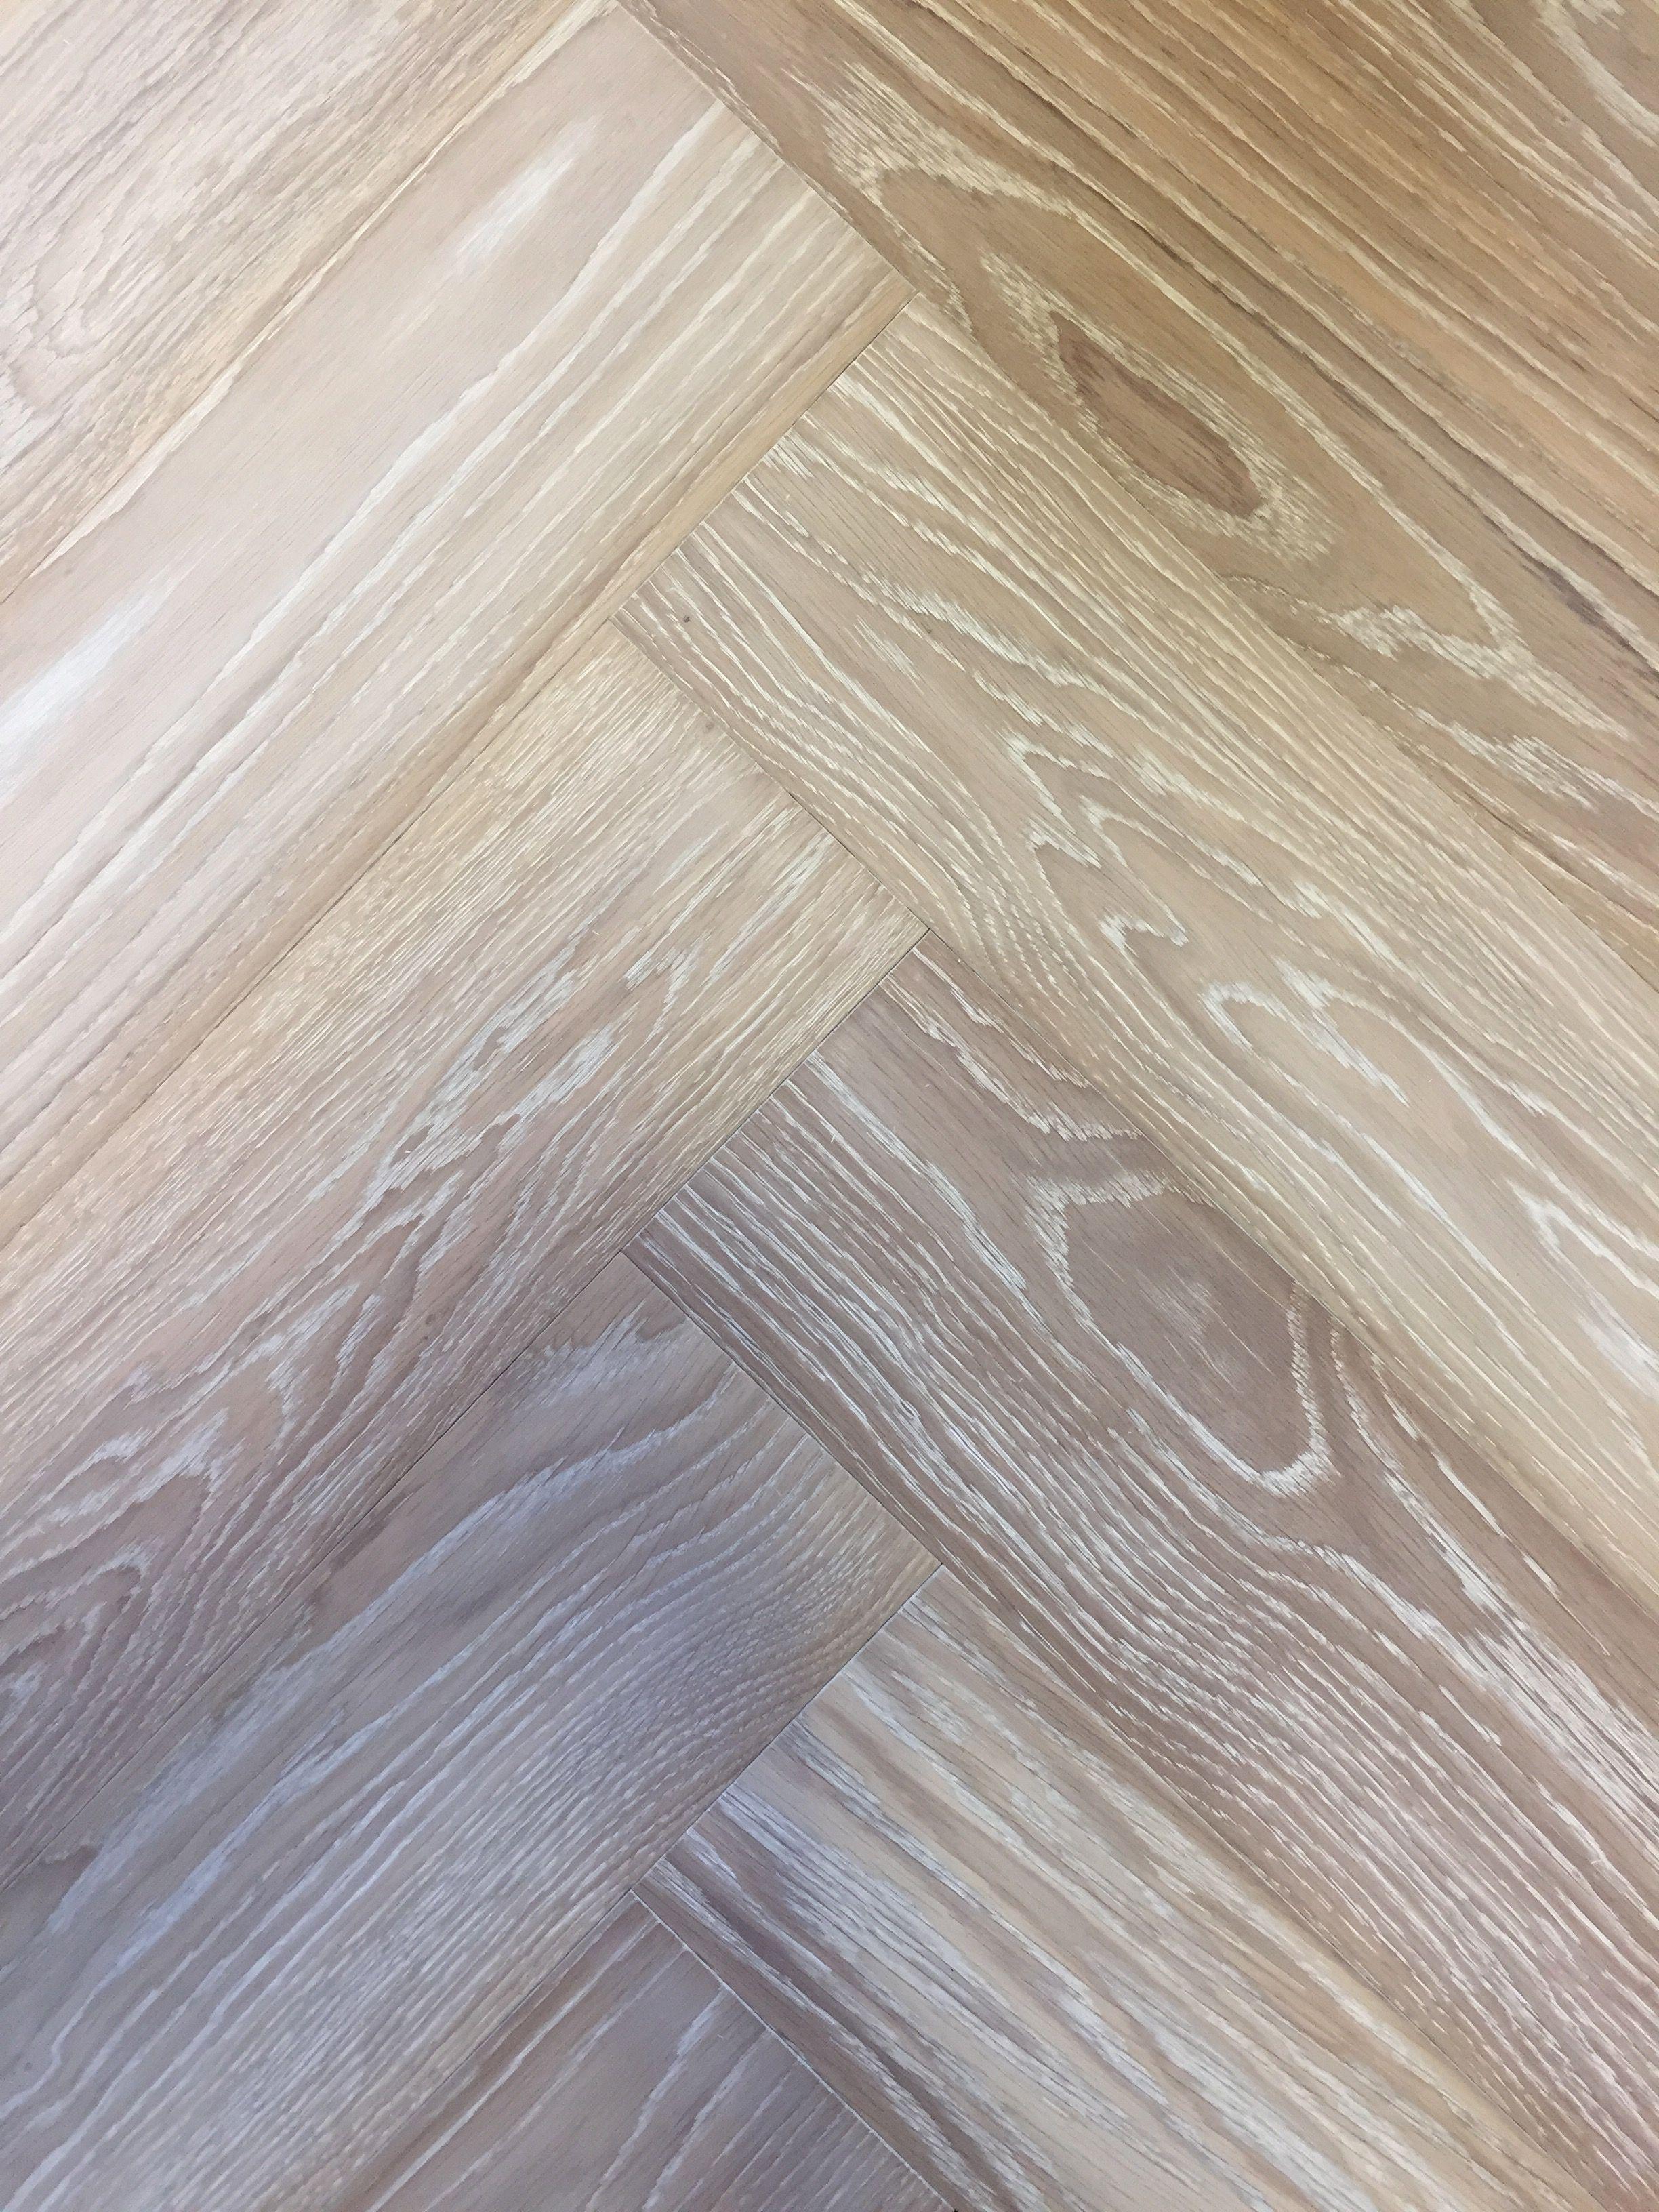 Russian White Oiled Engineered Herringbone Parquet Flooring With White Pores